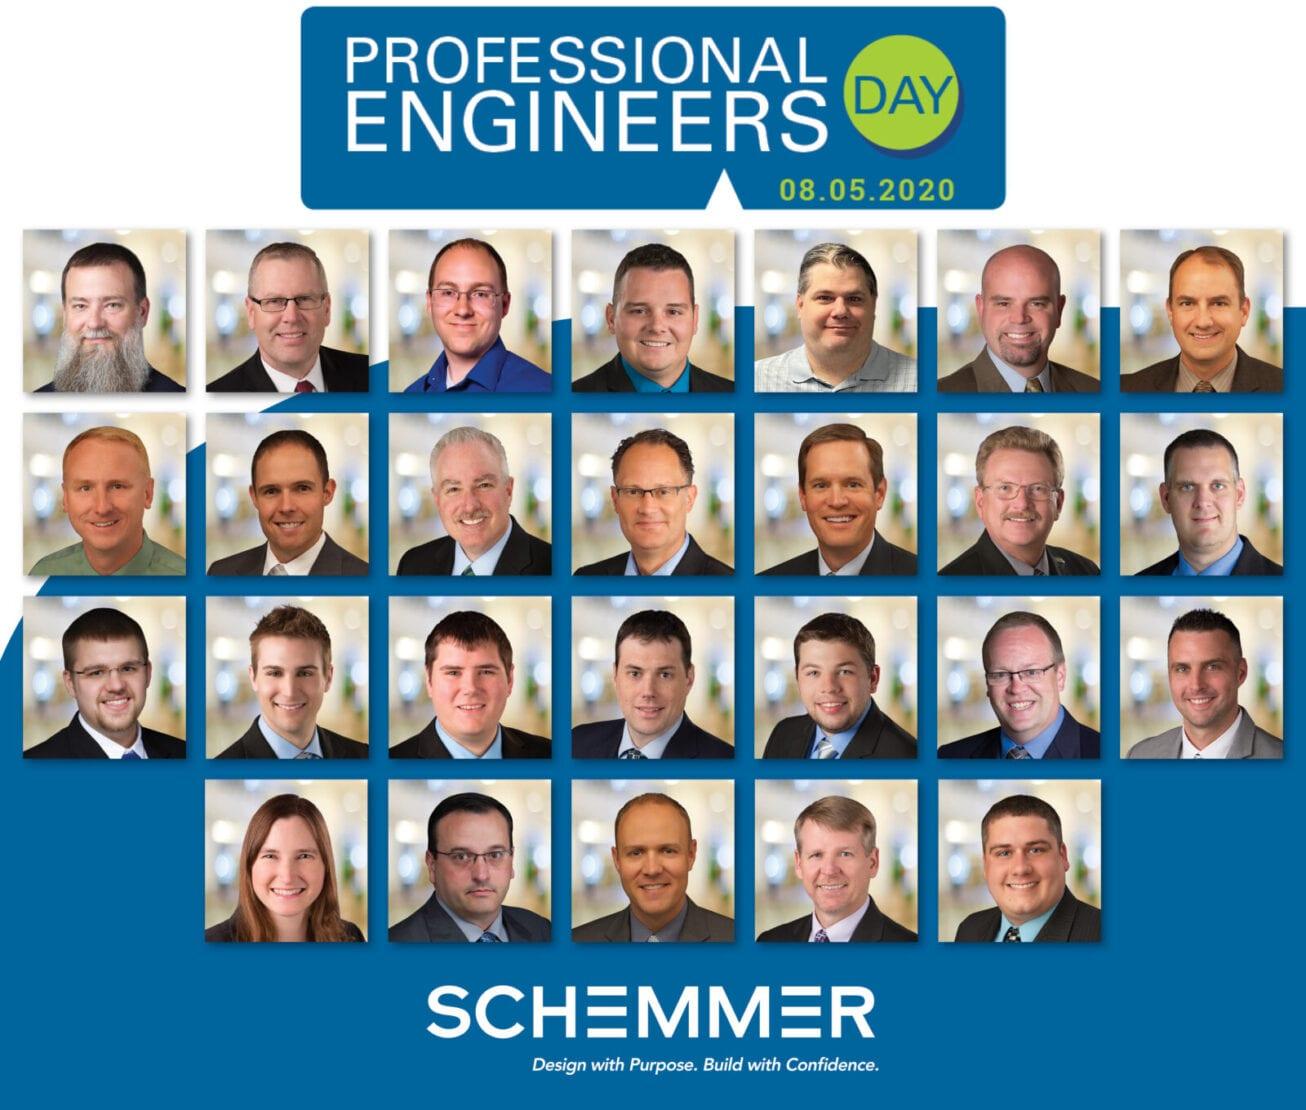 26 Professional Engineers Day! Schemmer